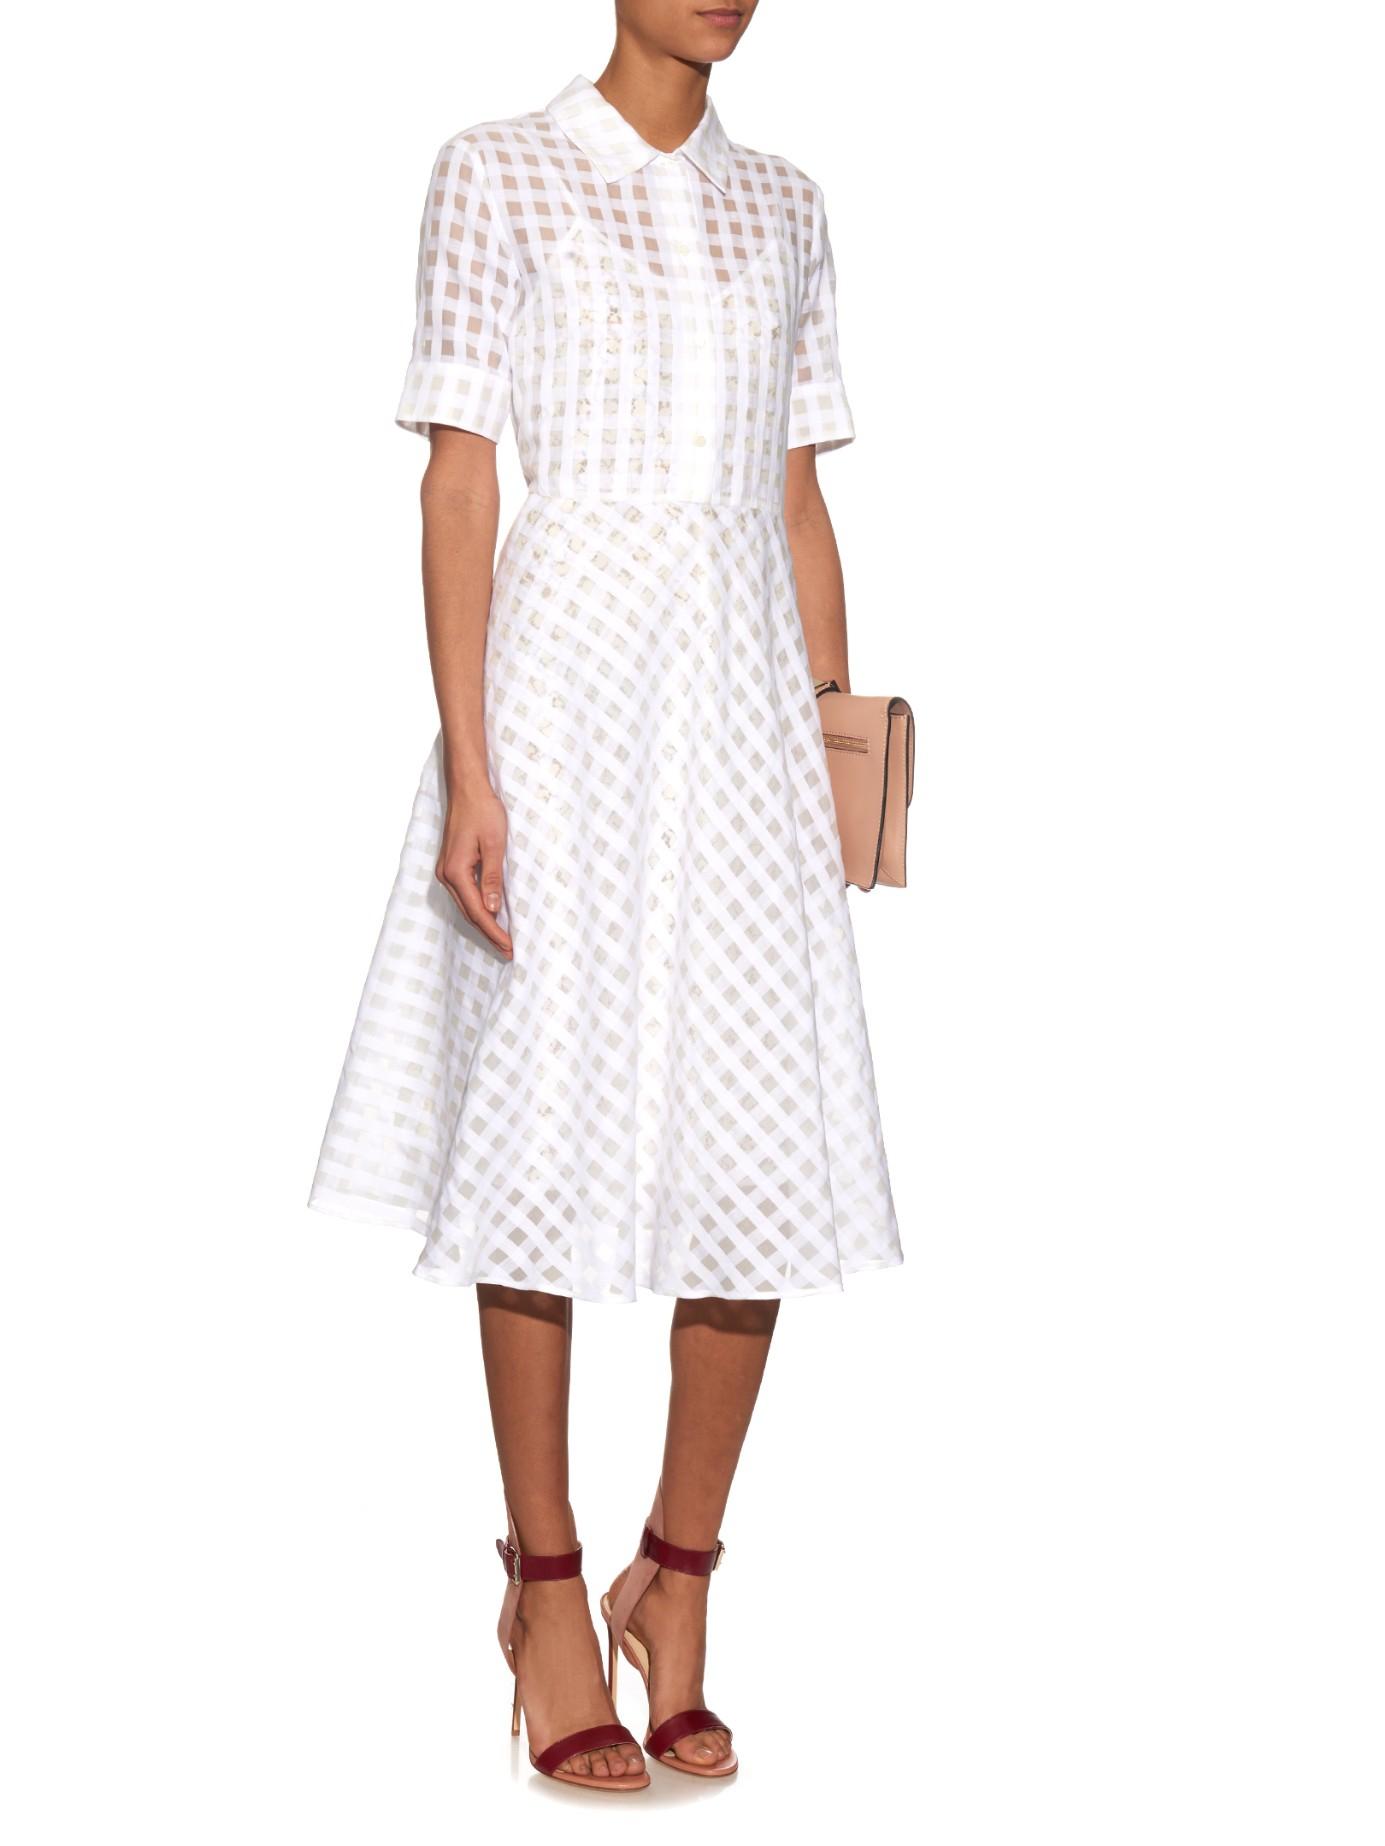 max mara studio morgana dress in white lyst. Black Bedroom Furniture Sets. Home Design Ideas